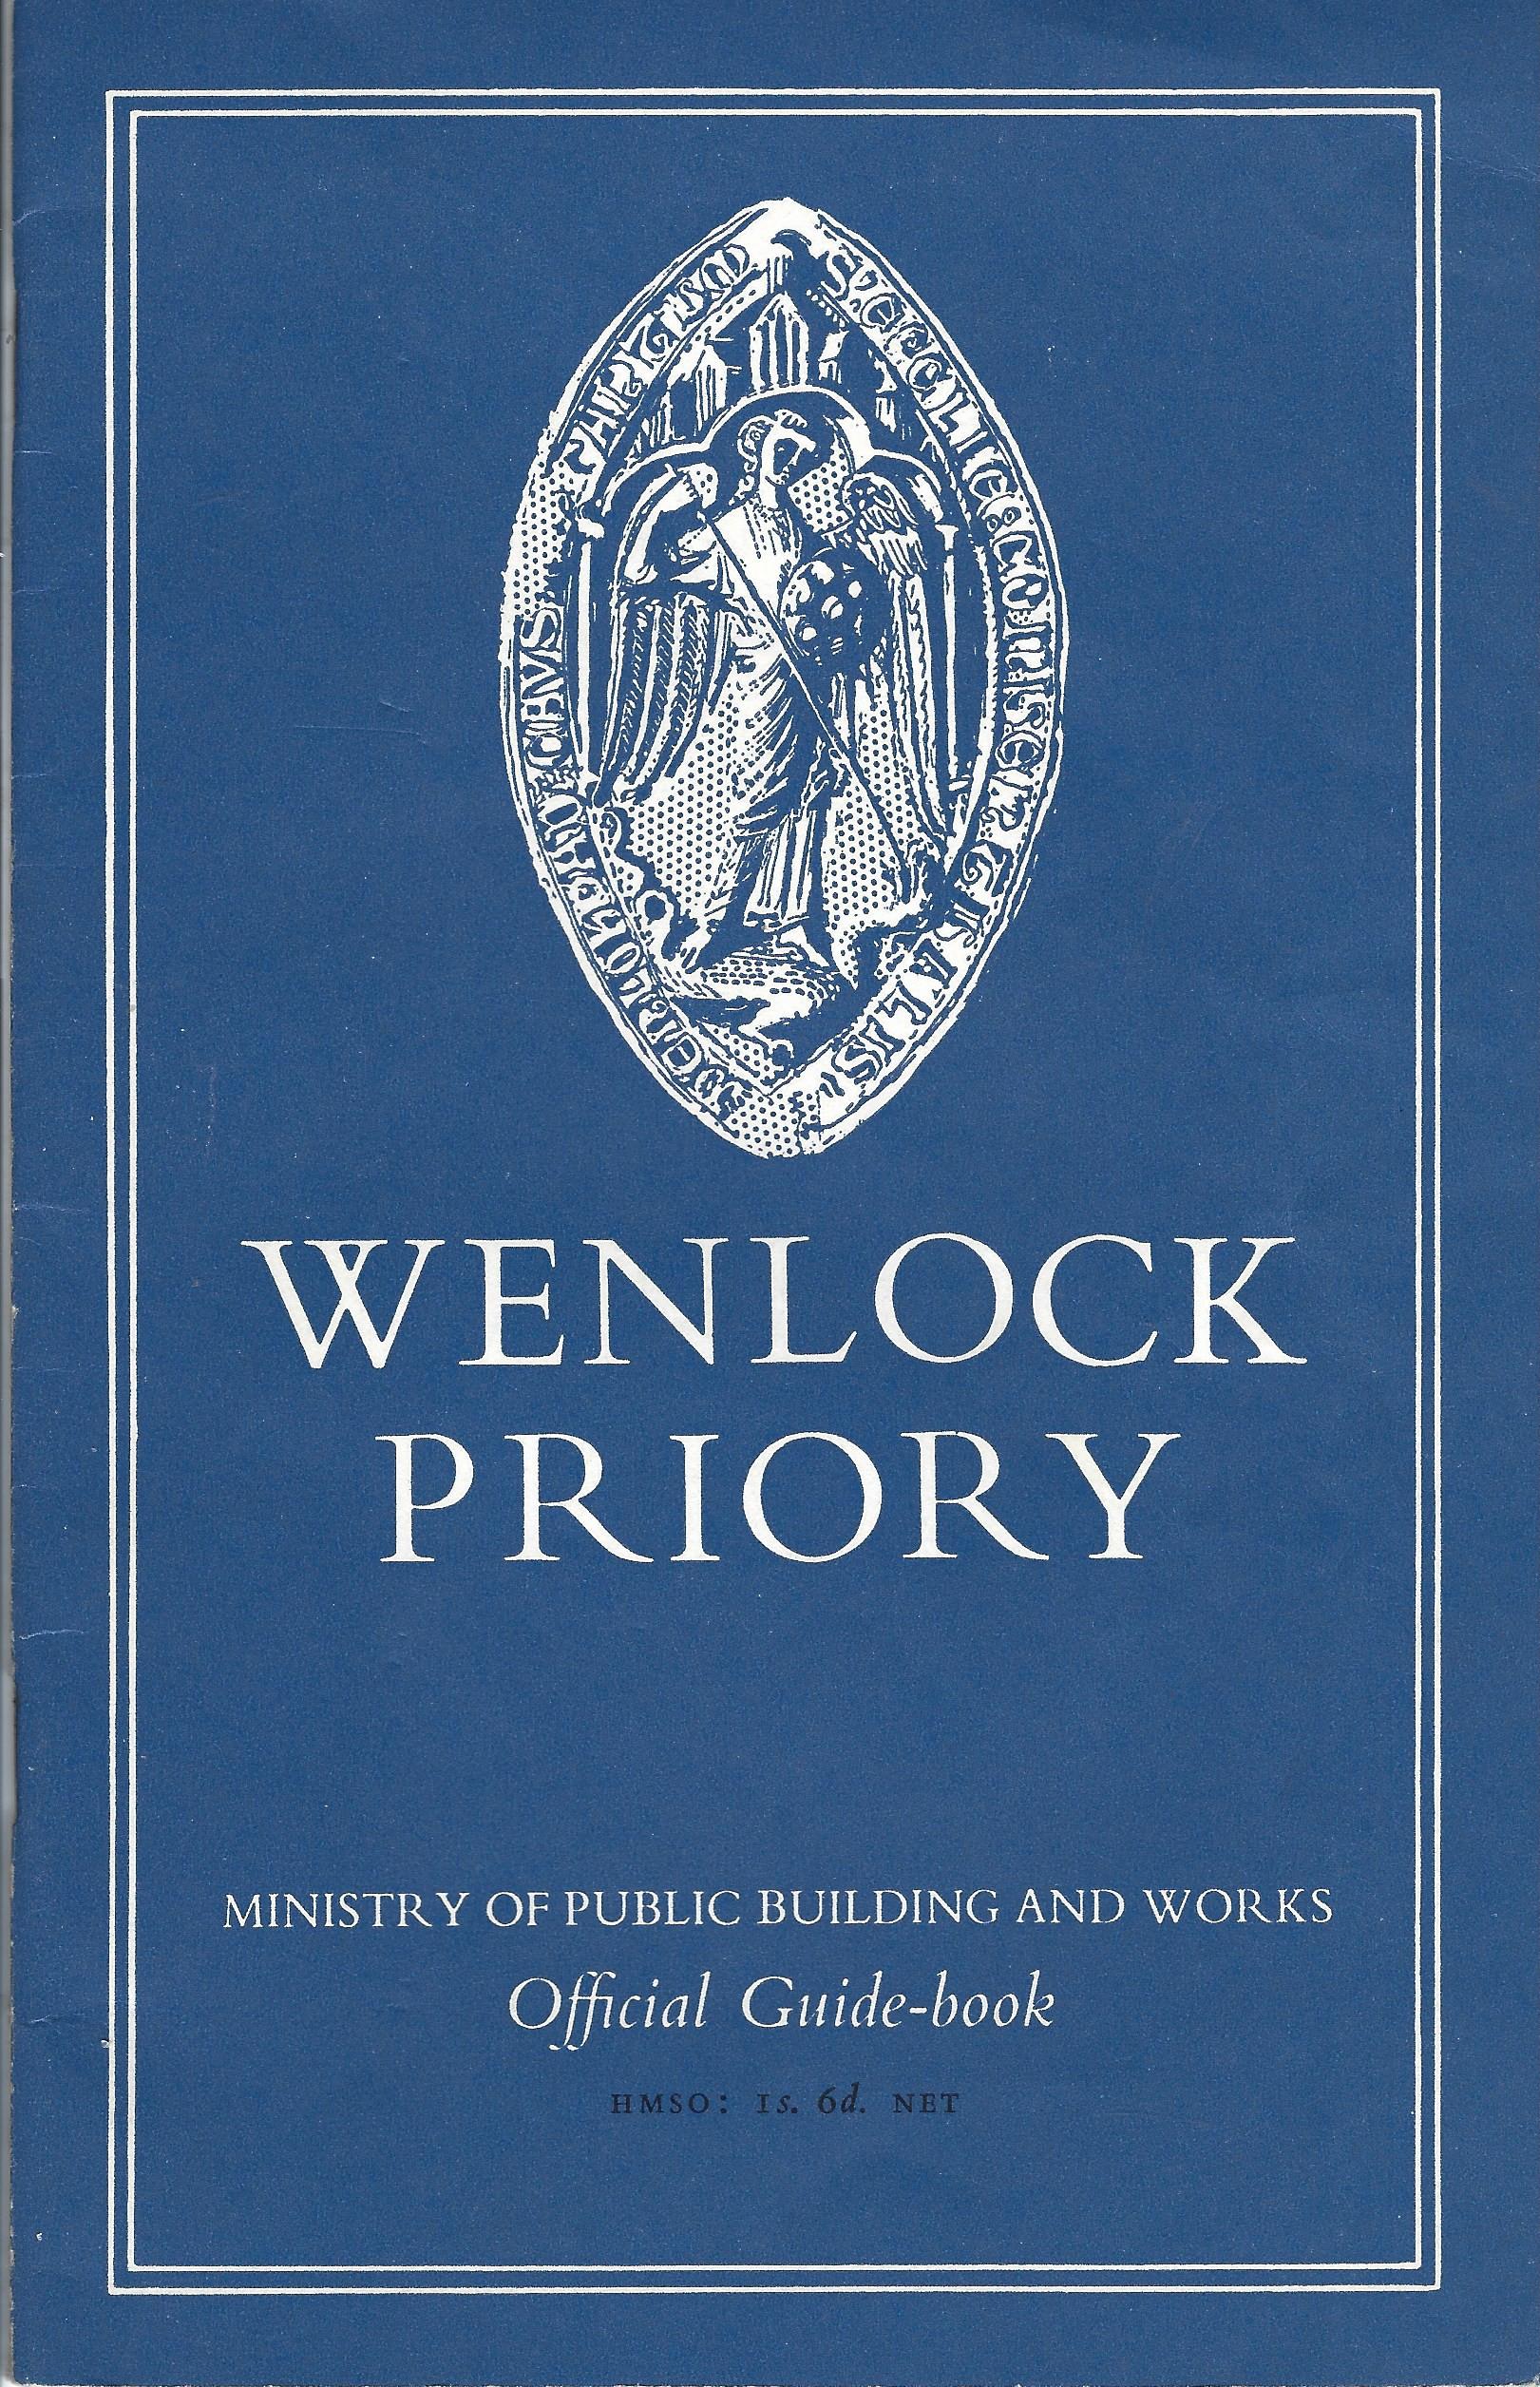 Wenlock_MPBW